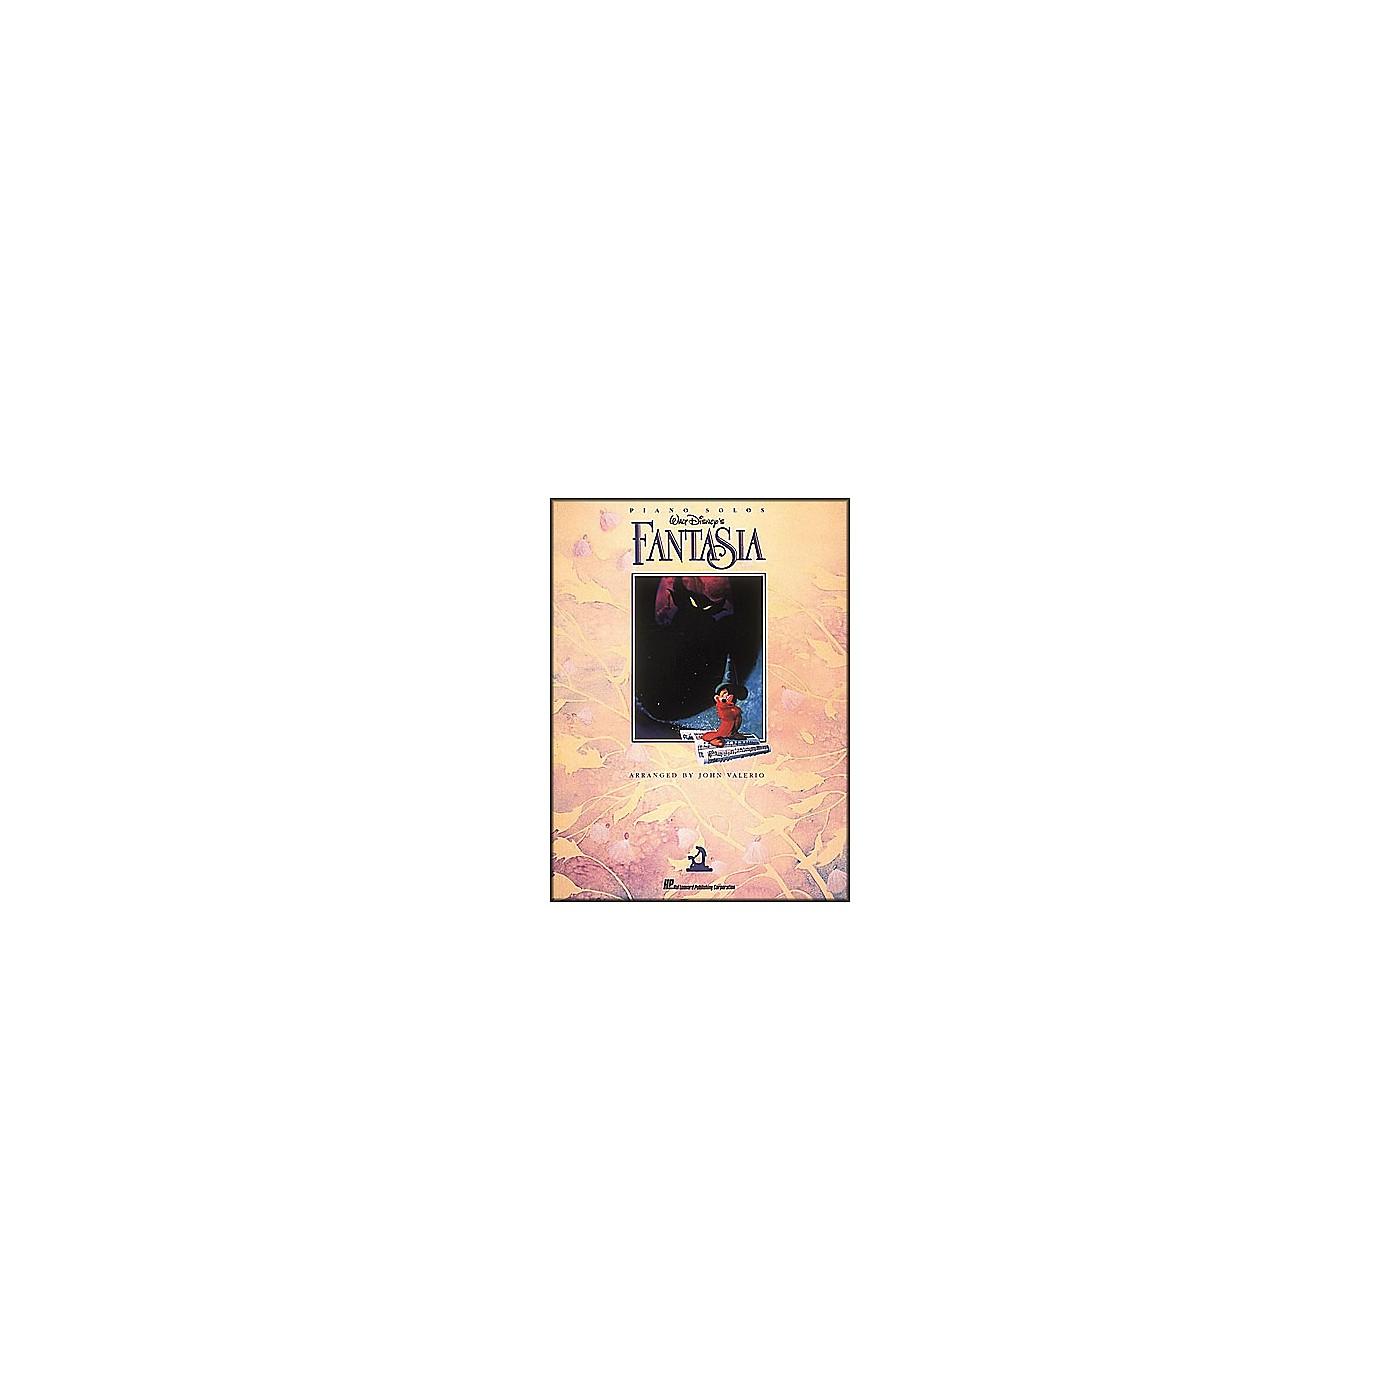 Hal Leonard Fantasia arranged for piano solo thumbnail